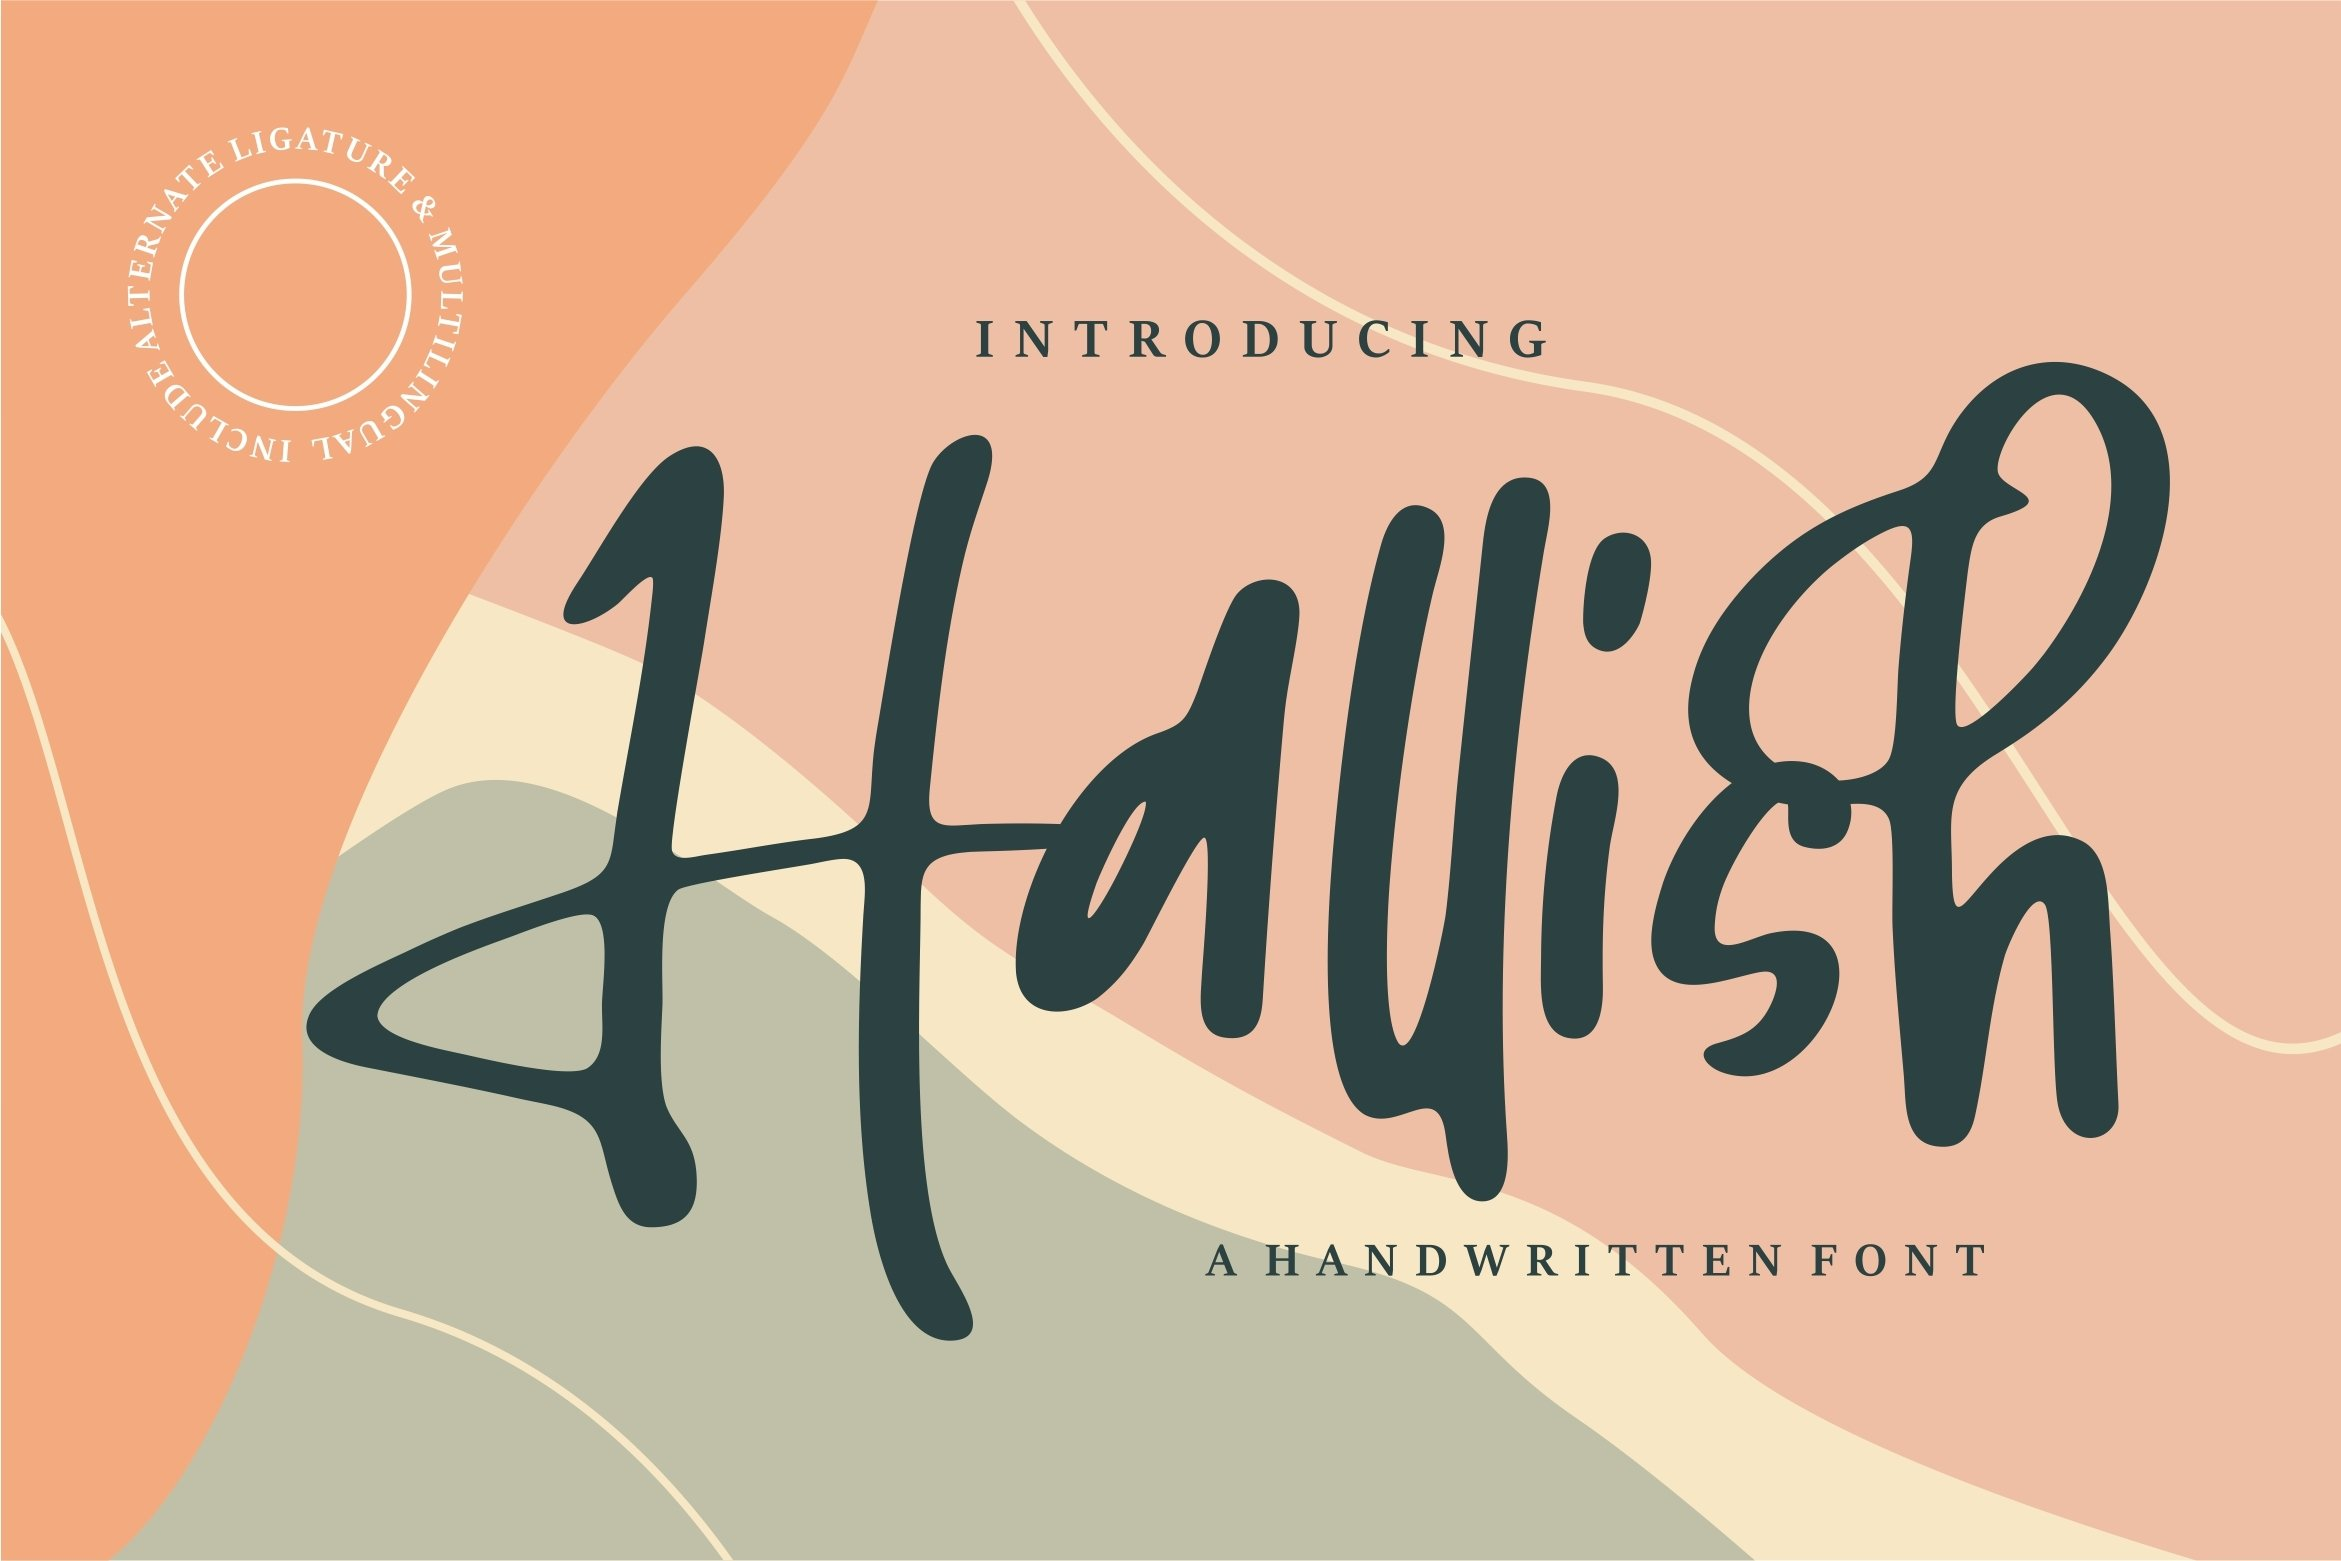 Hallish - A Handwritten Font example image 1